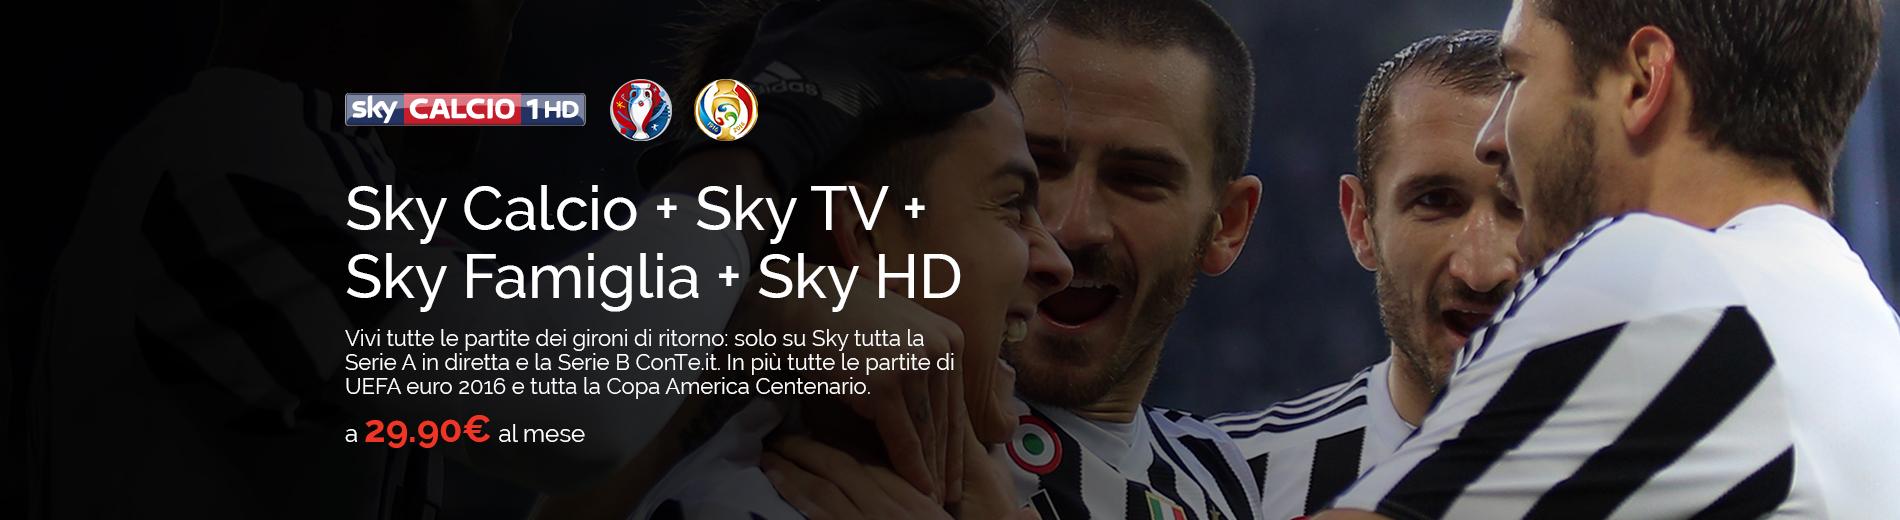 Banner_Sky-Calcio